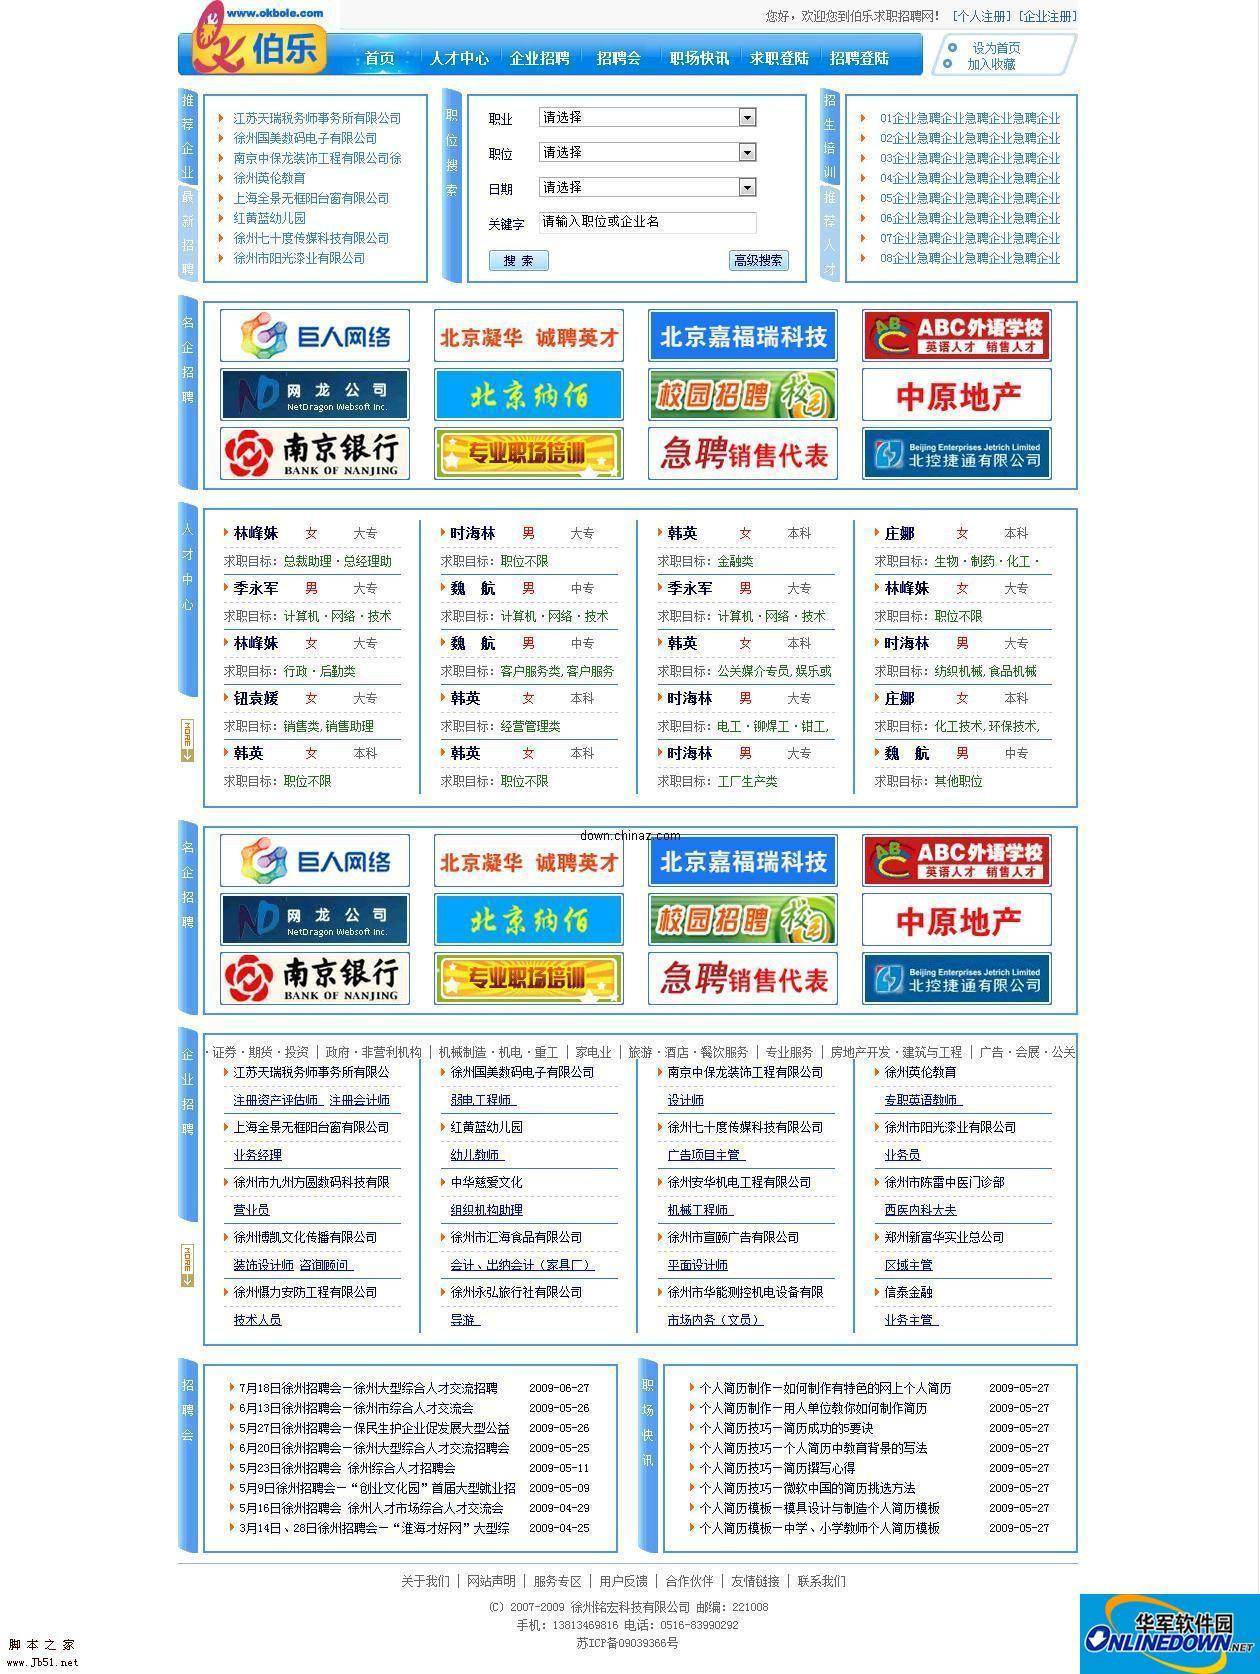 asp.net OK伯乐招聘求职系统  build 090705 PC版